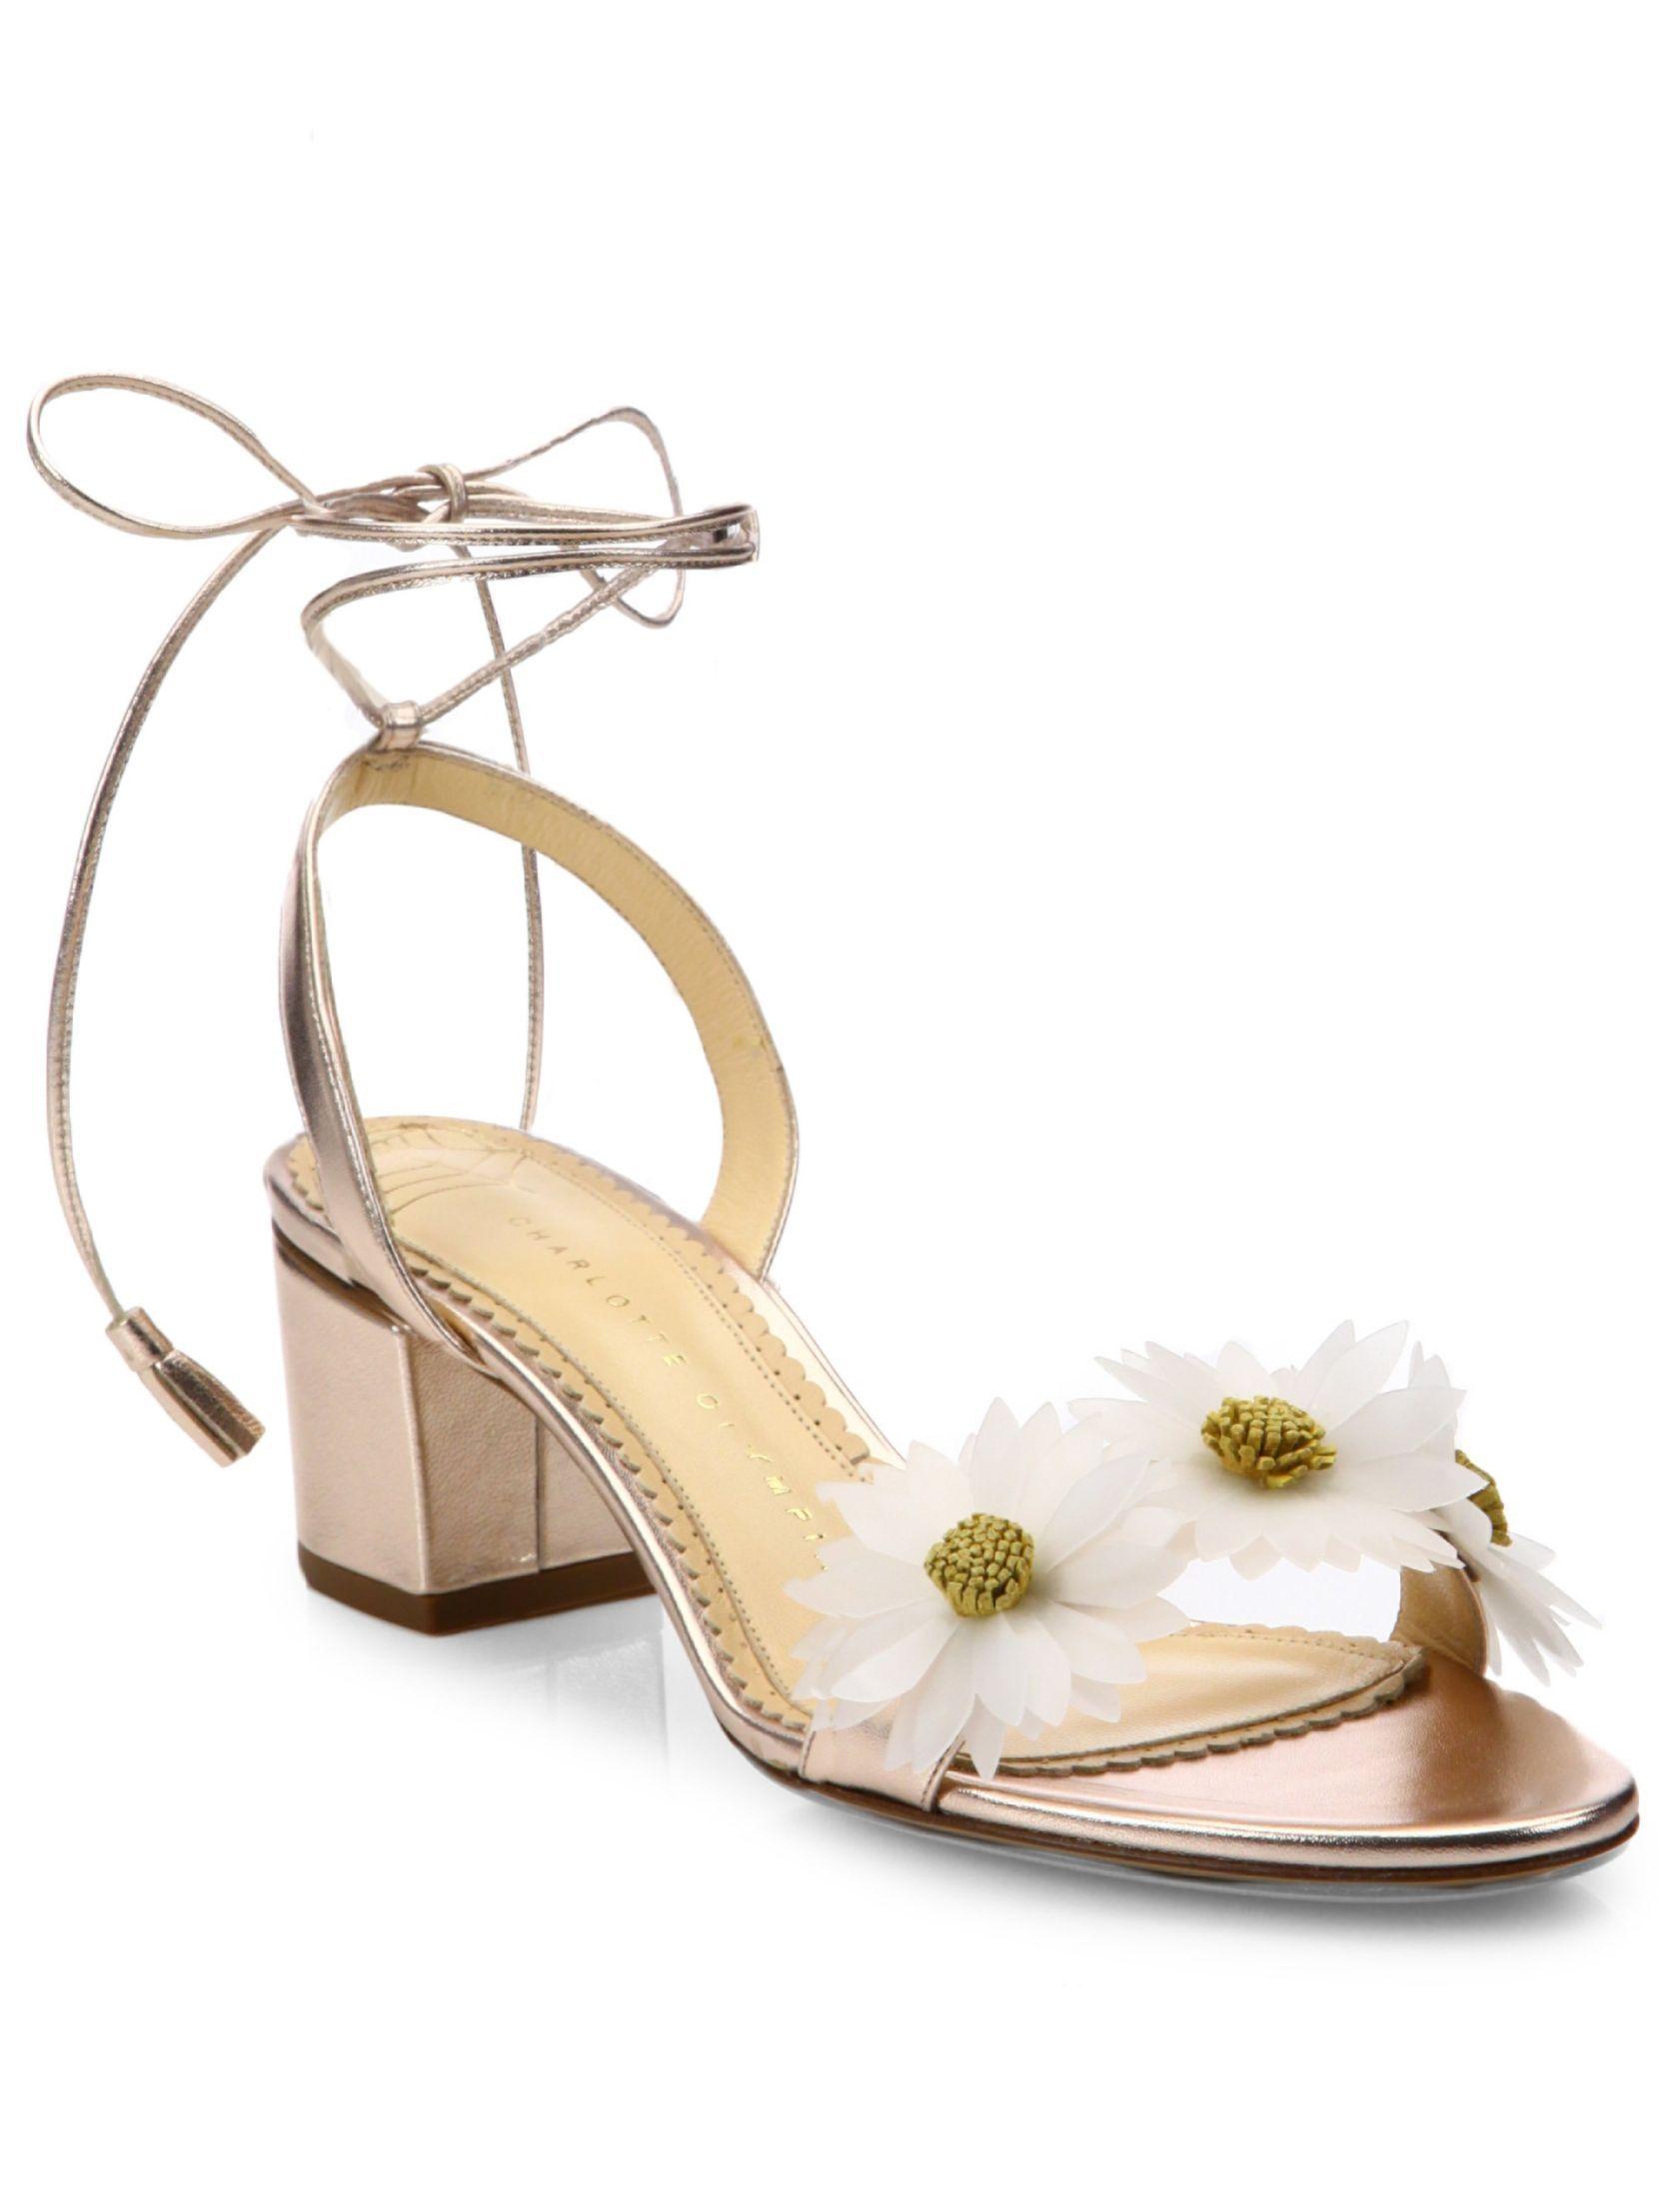 ddabc0843500e Charlotte Olympia Tara Flower Metallic Leather Block-Heel Sandals   charlotteolympiaheelsmetallicleather